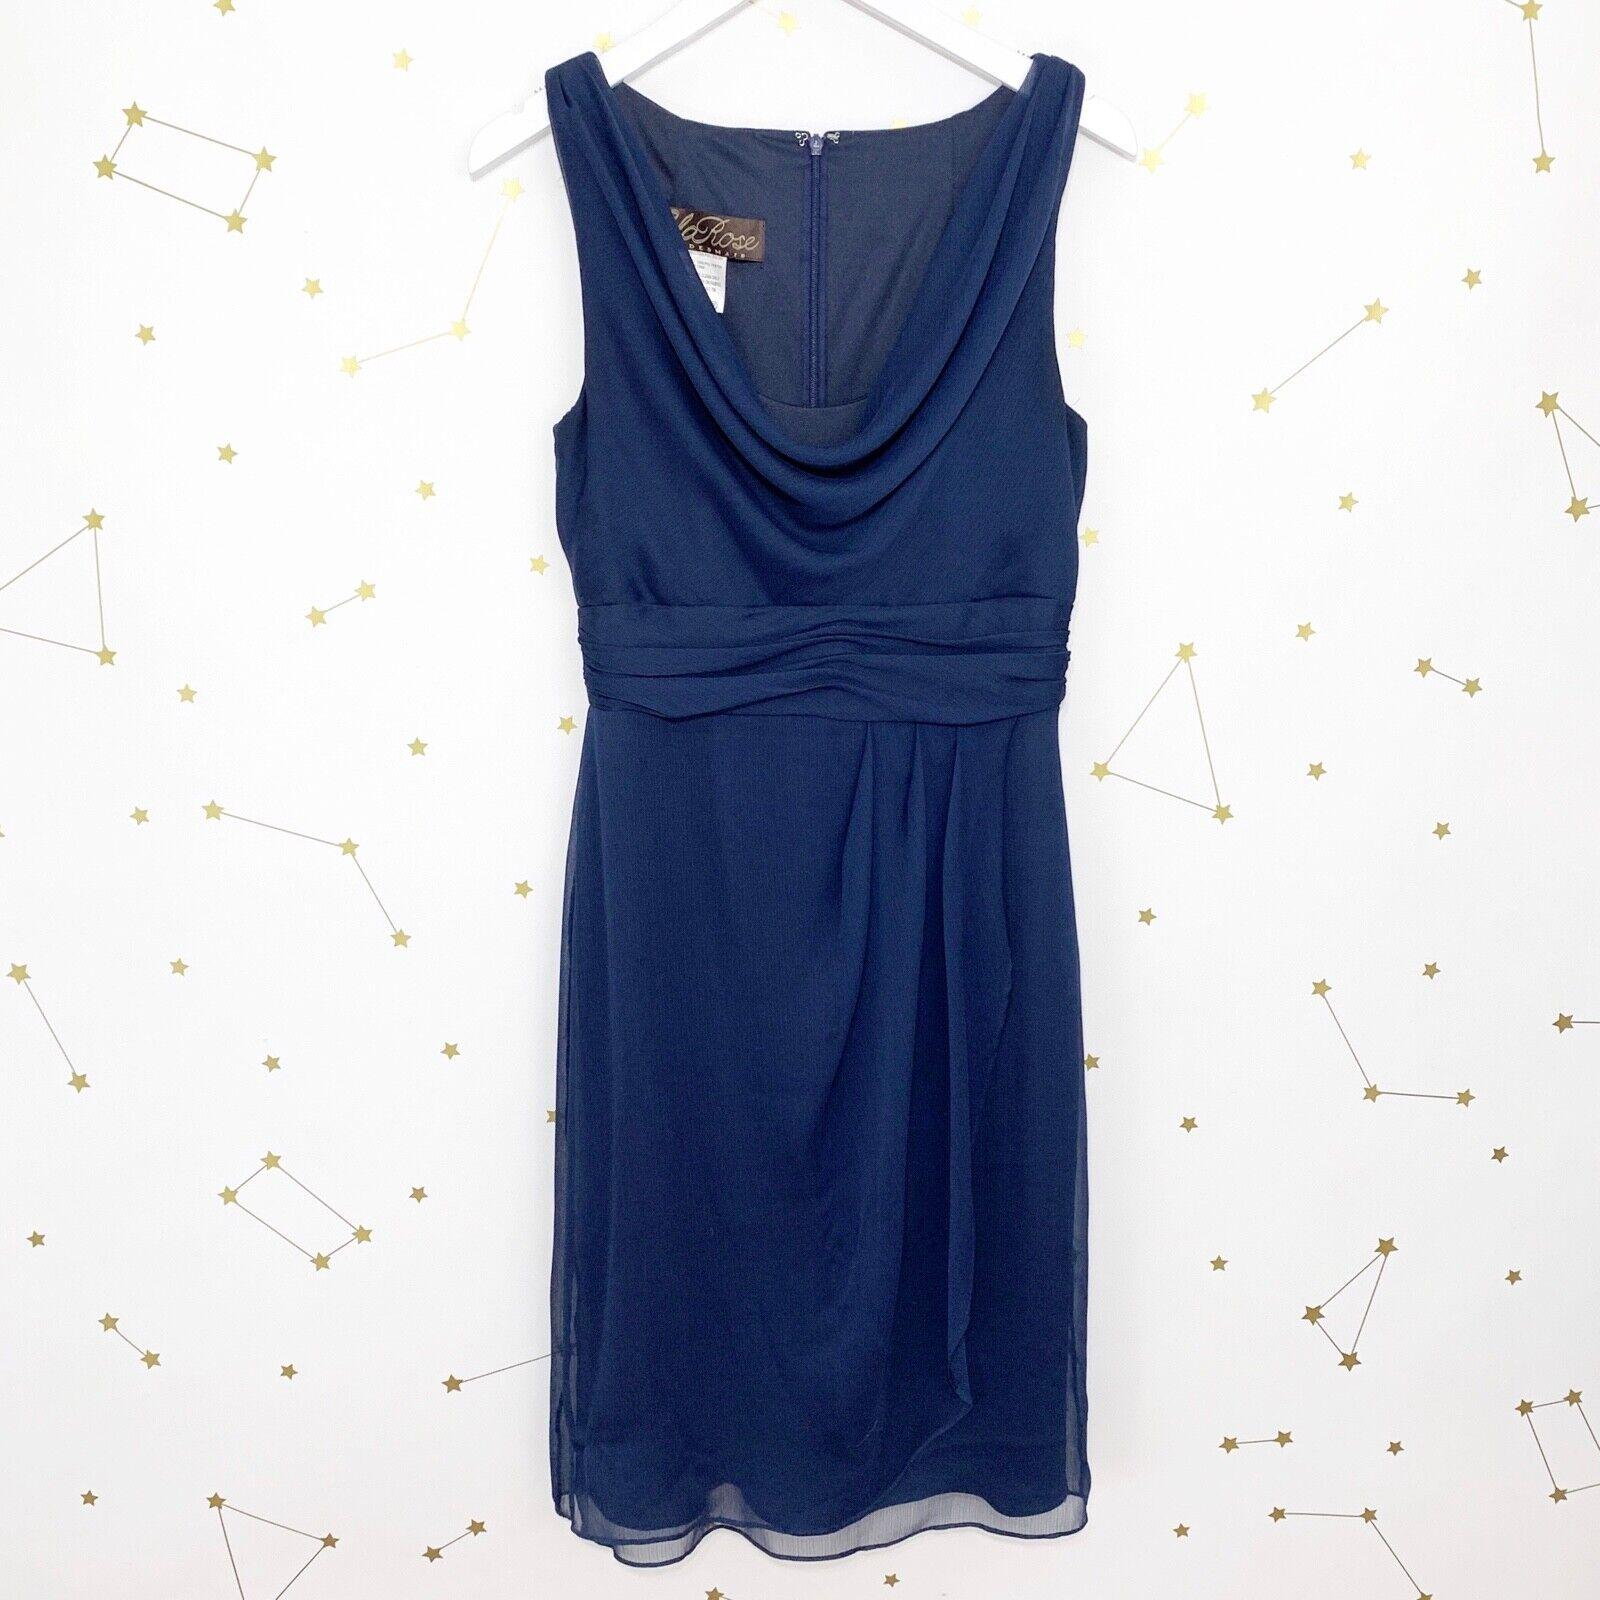 Lela Rose Bridesmaid Dress Size 4 Midnight Blue LR153 Sleeveless Chiffon Draped